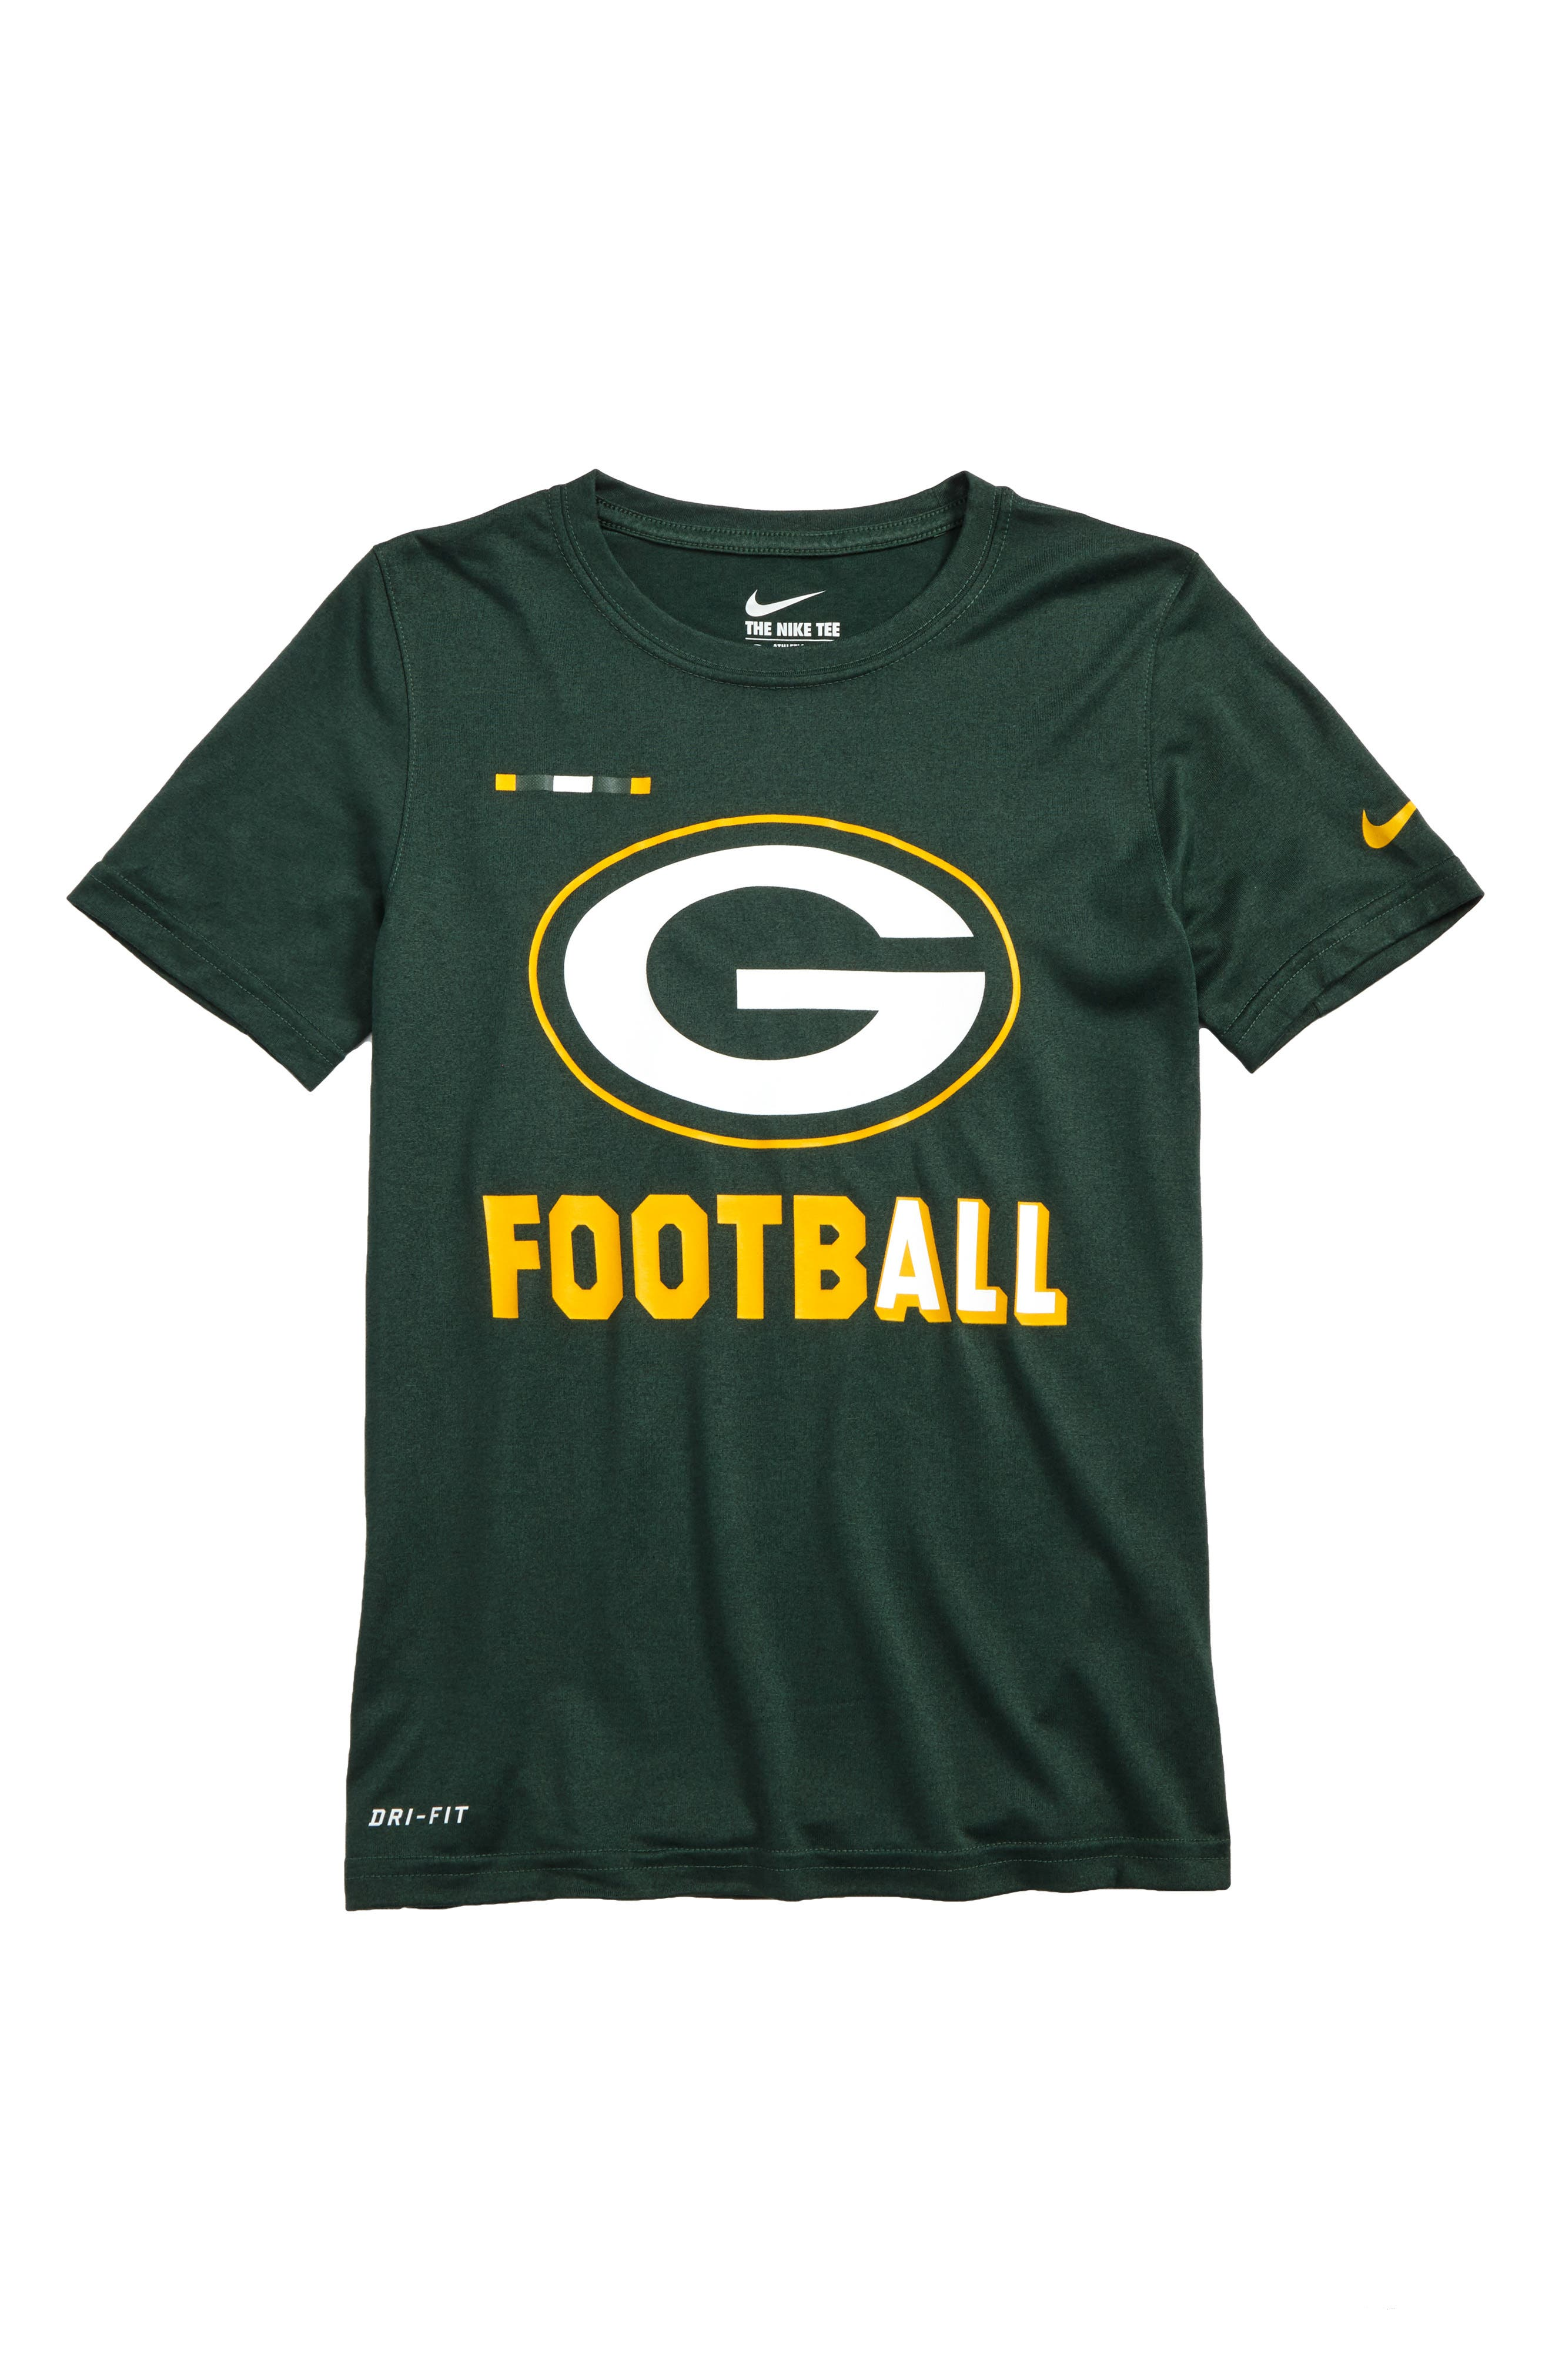 Nike NFL Logo - Green Bay Packers Dry T-Shirt,                             Main thumbnail 1, color,                             302